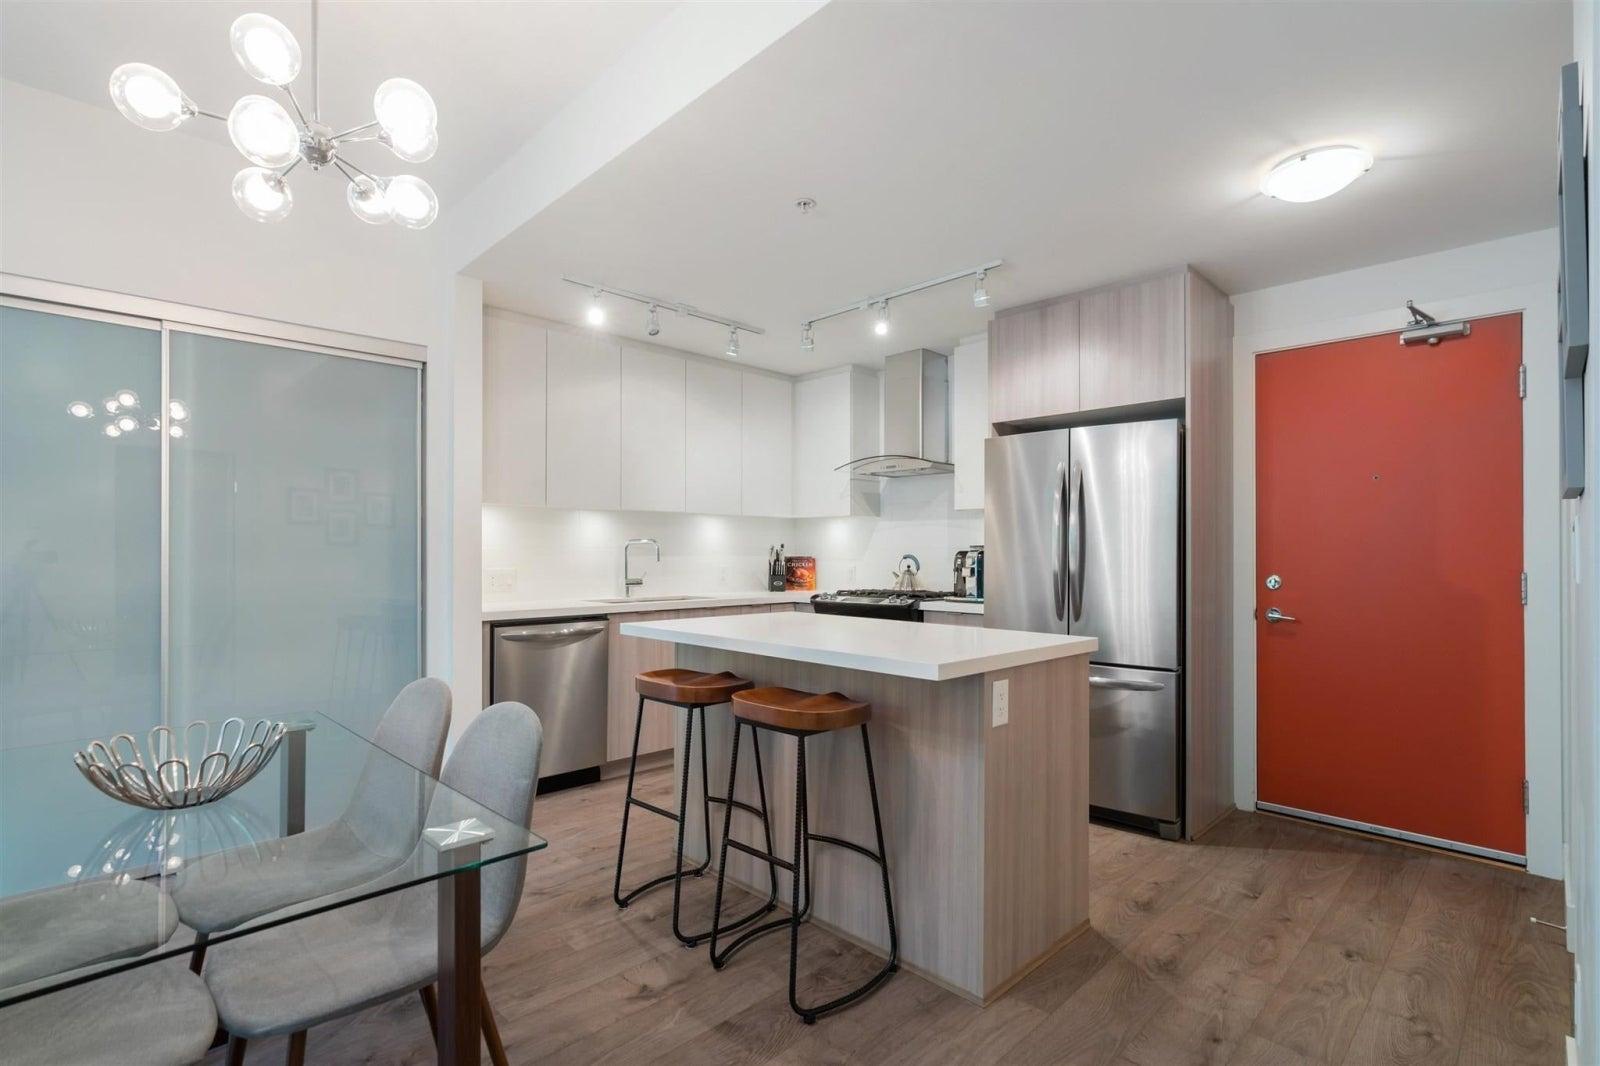 222 3602 ALDERCREST DRIVE - Roche Point Apartment/Condo for sale, 2 Bedrooms (R2603975) #8